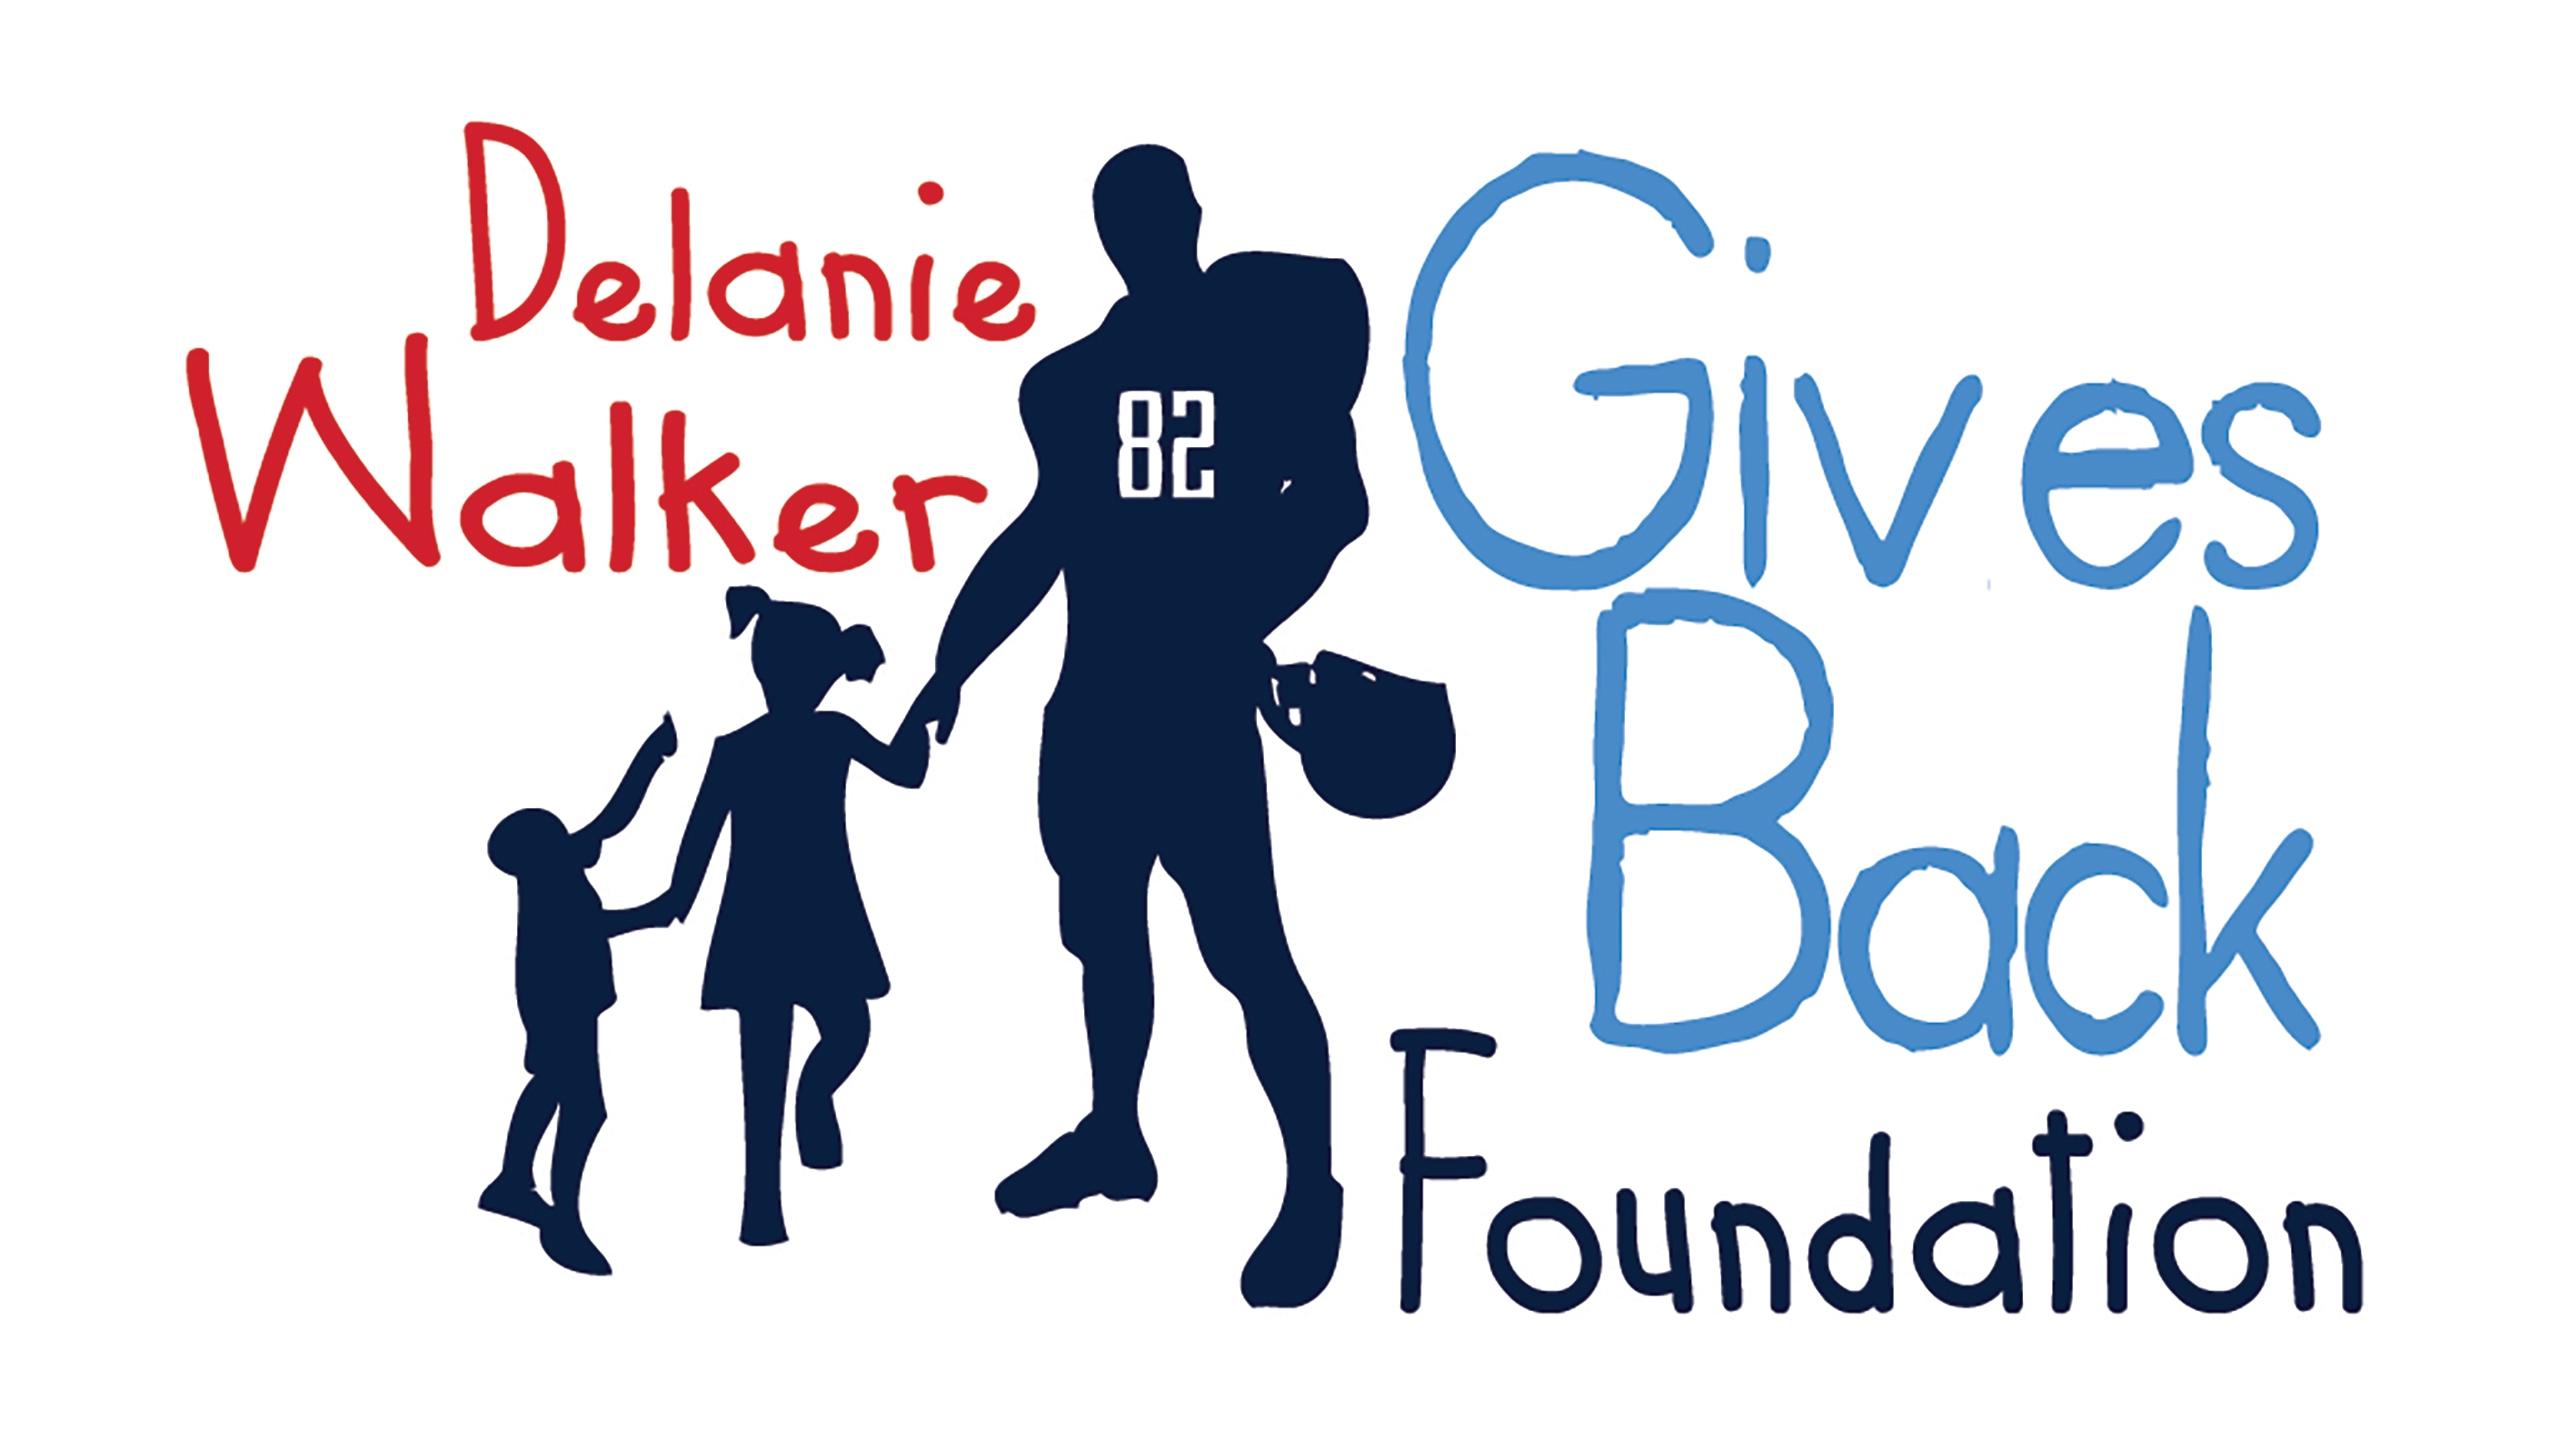 Delanie Walker - The Delanie Walker Gives Back Foundation